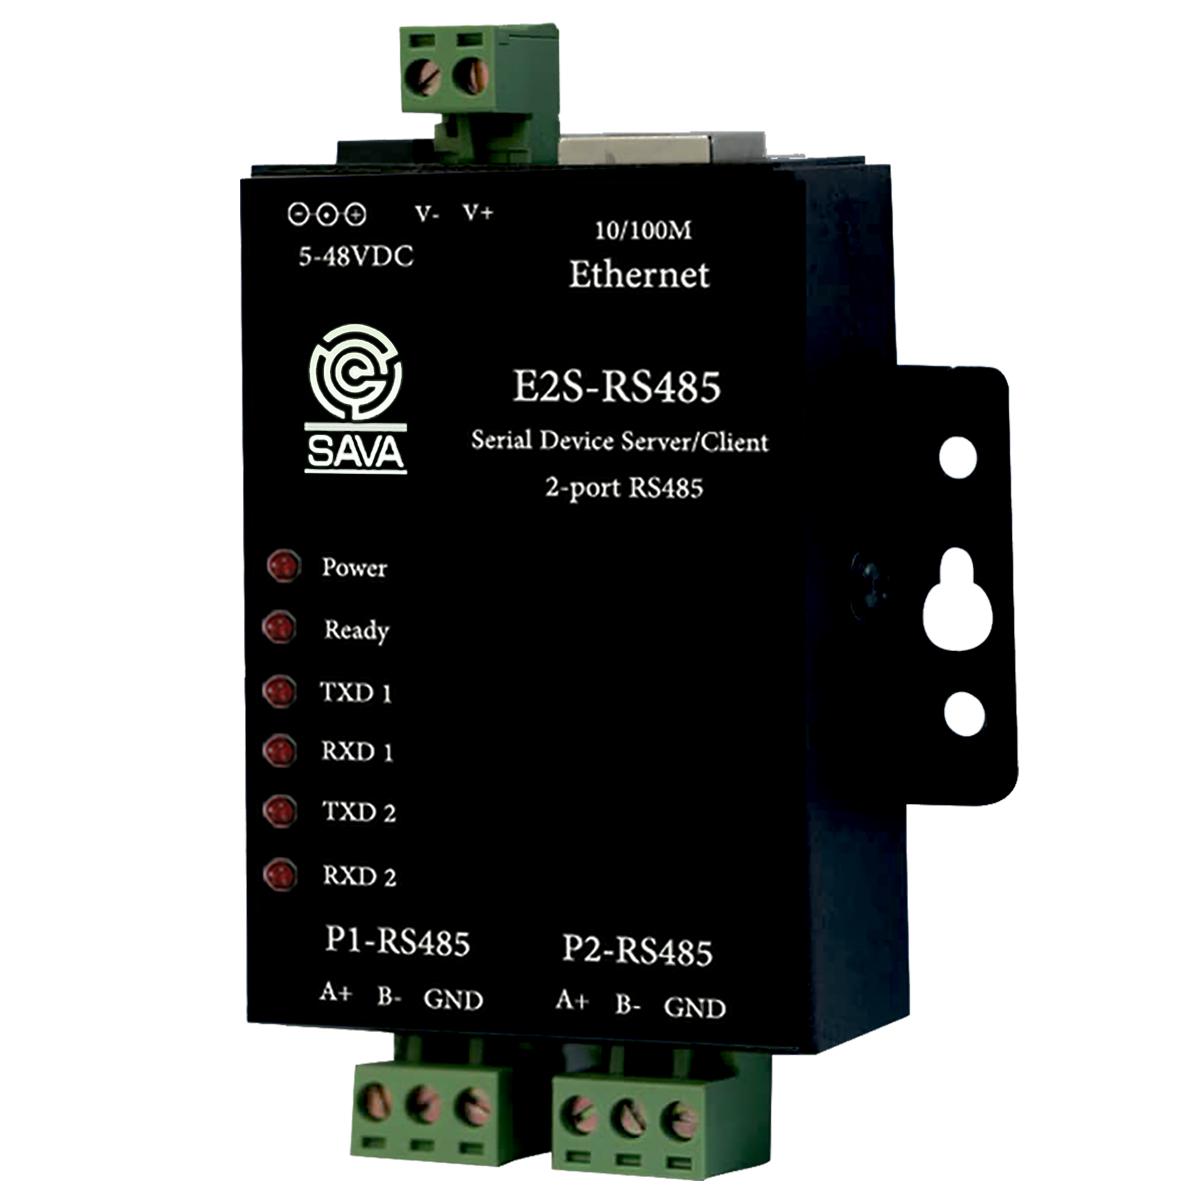 مبدل سریال به اترنت ساوا مدل E2S-RS485